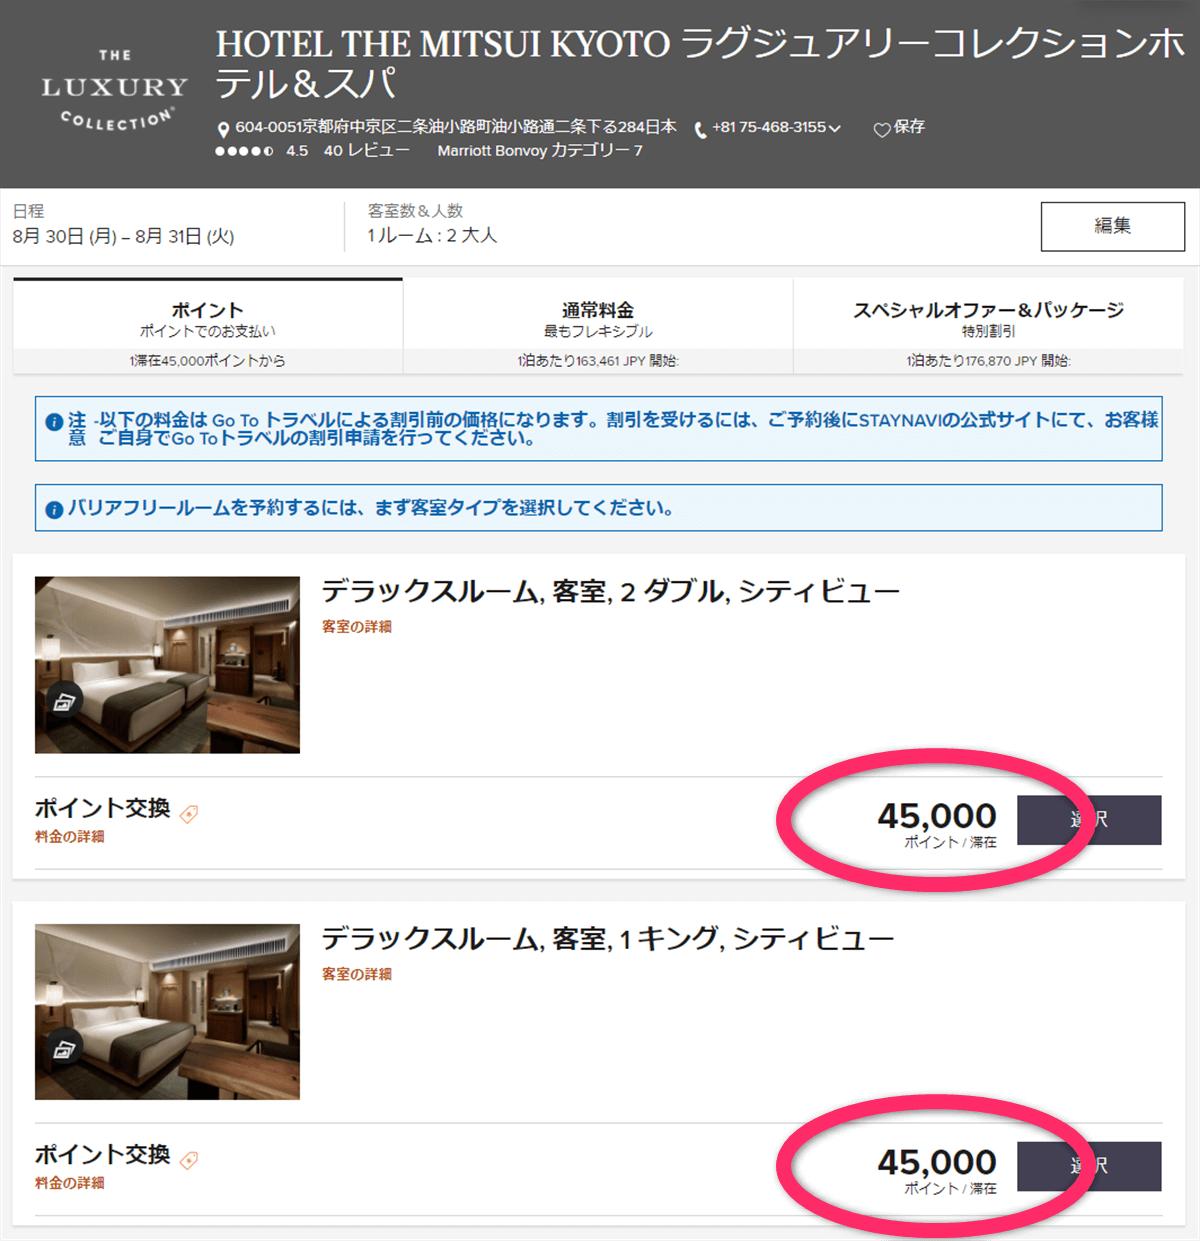 HOTEL THE MITSUI KYOTOのポイント宿泊のポイント数